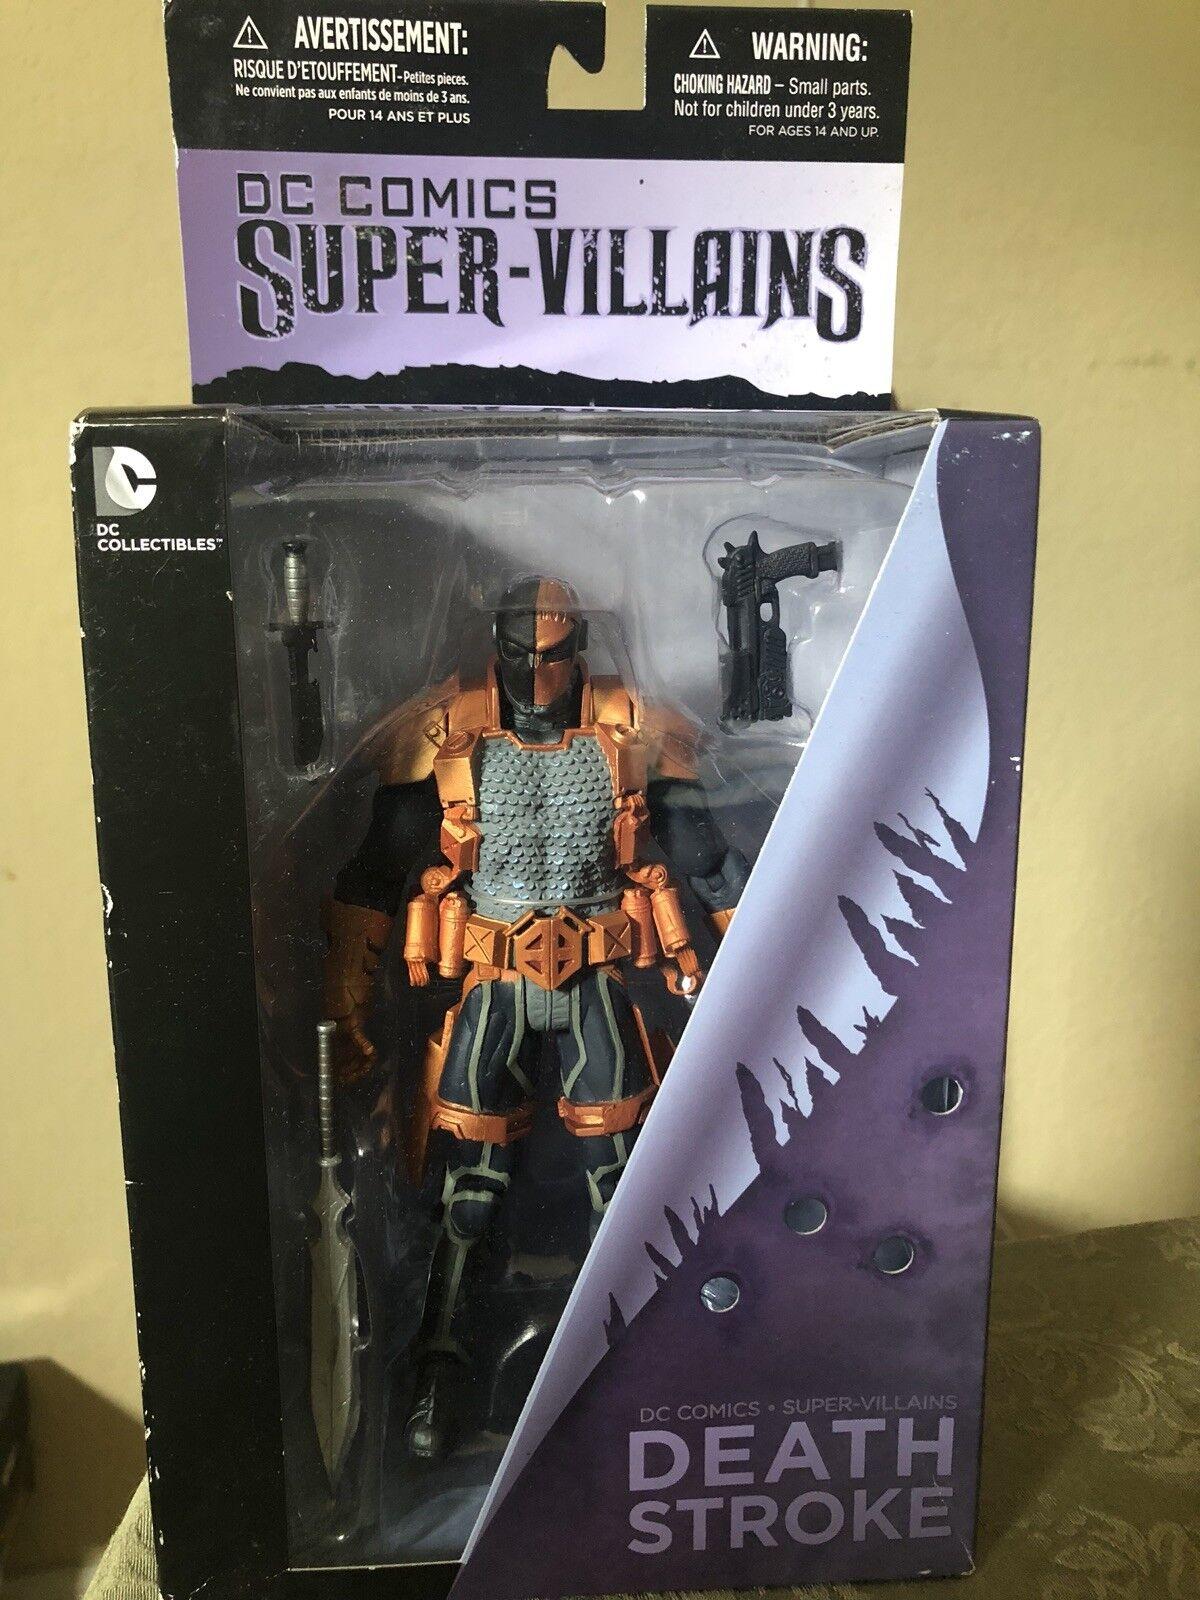 Deathstroke Super-Villains Action Figure DC Comics DC Collectibles NEW SEALED